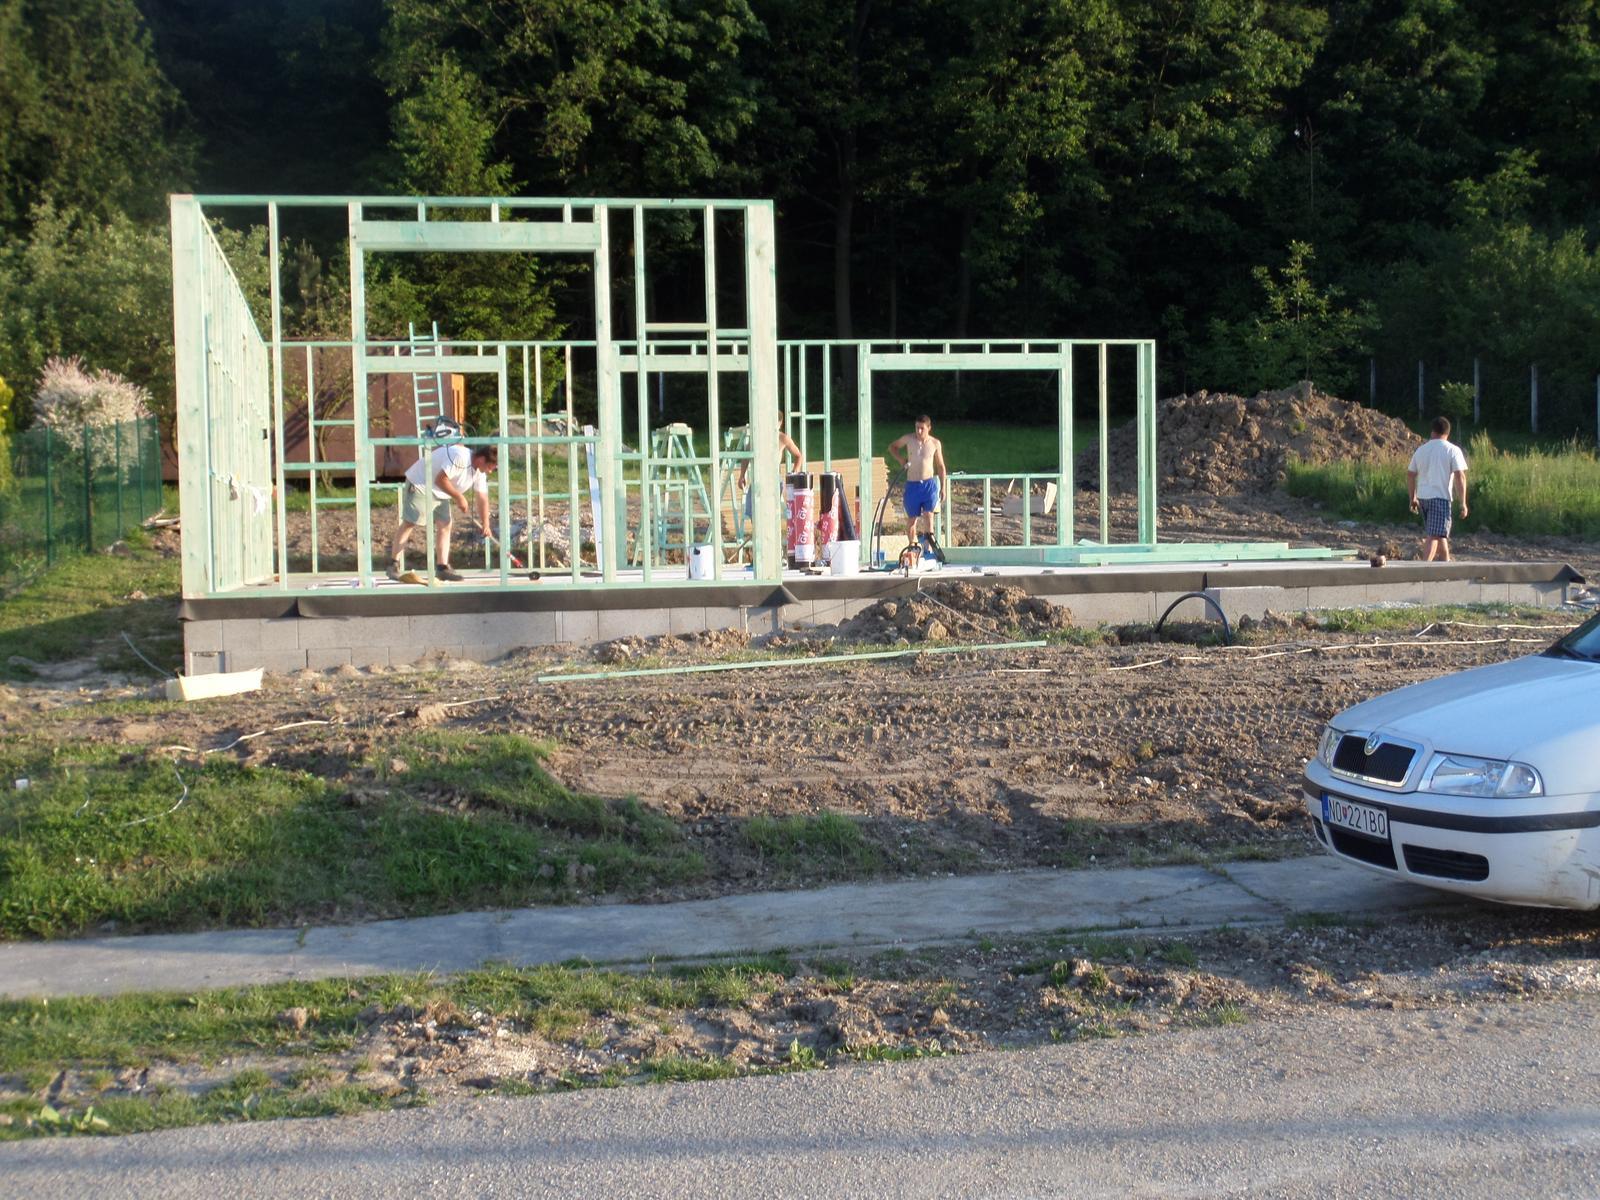 Bungalov Martina - 21.5.2014 - začala hrubá stavba